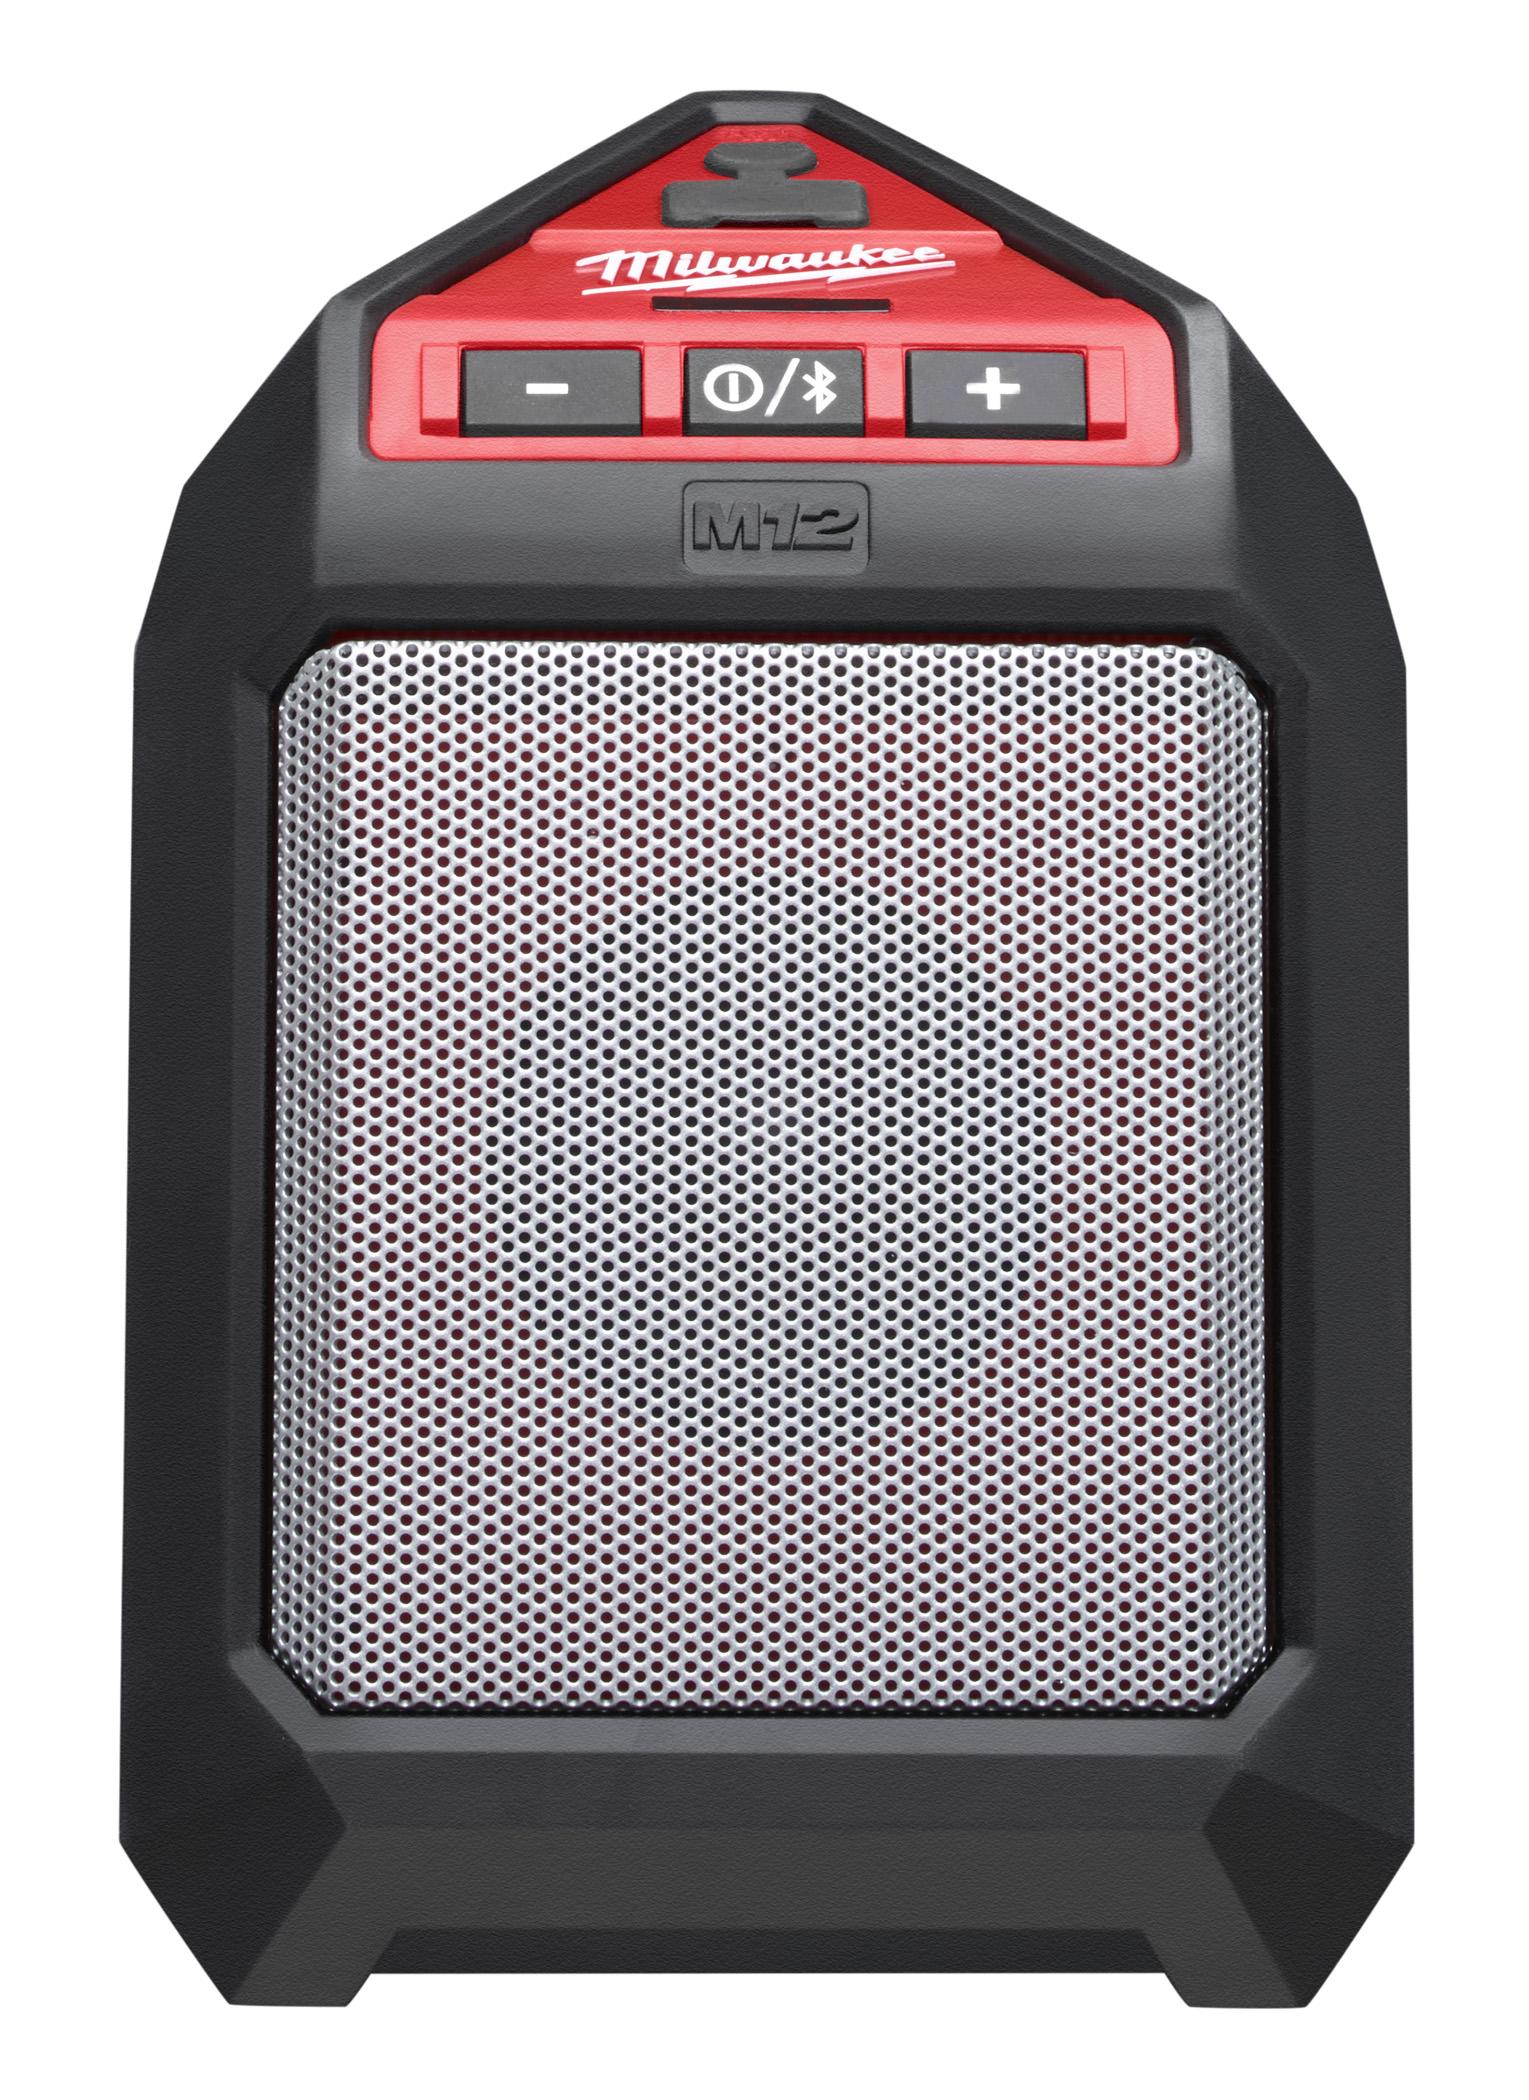 M12 12 Volt Lithium-Ion Cordless Wireless Jobsite Speaker